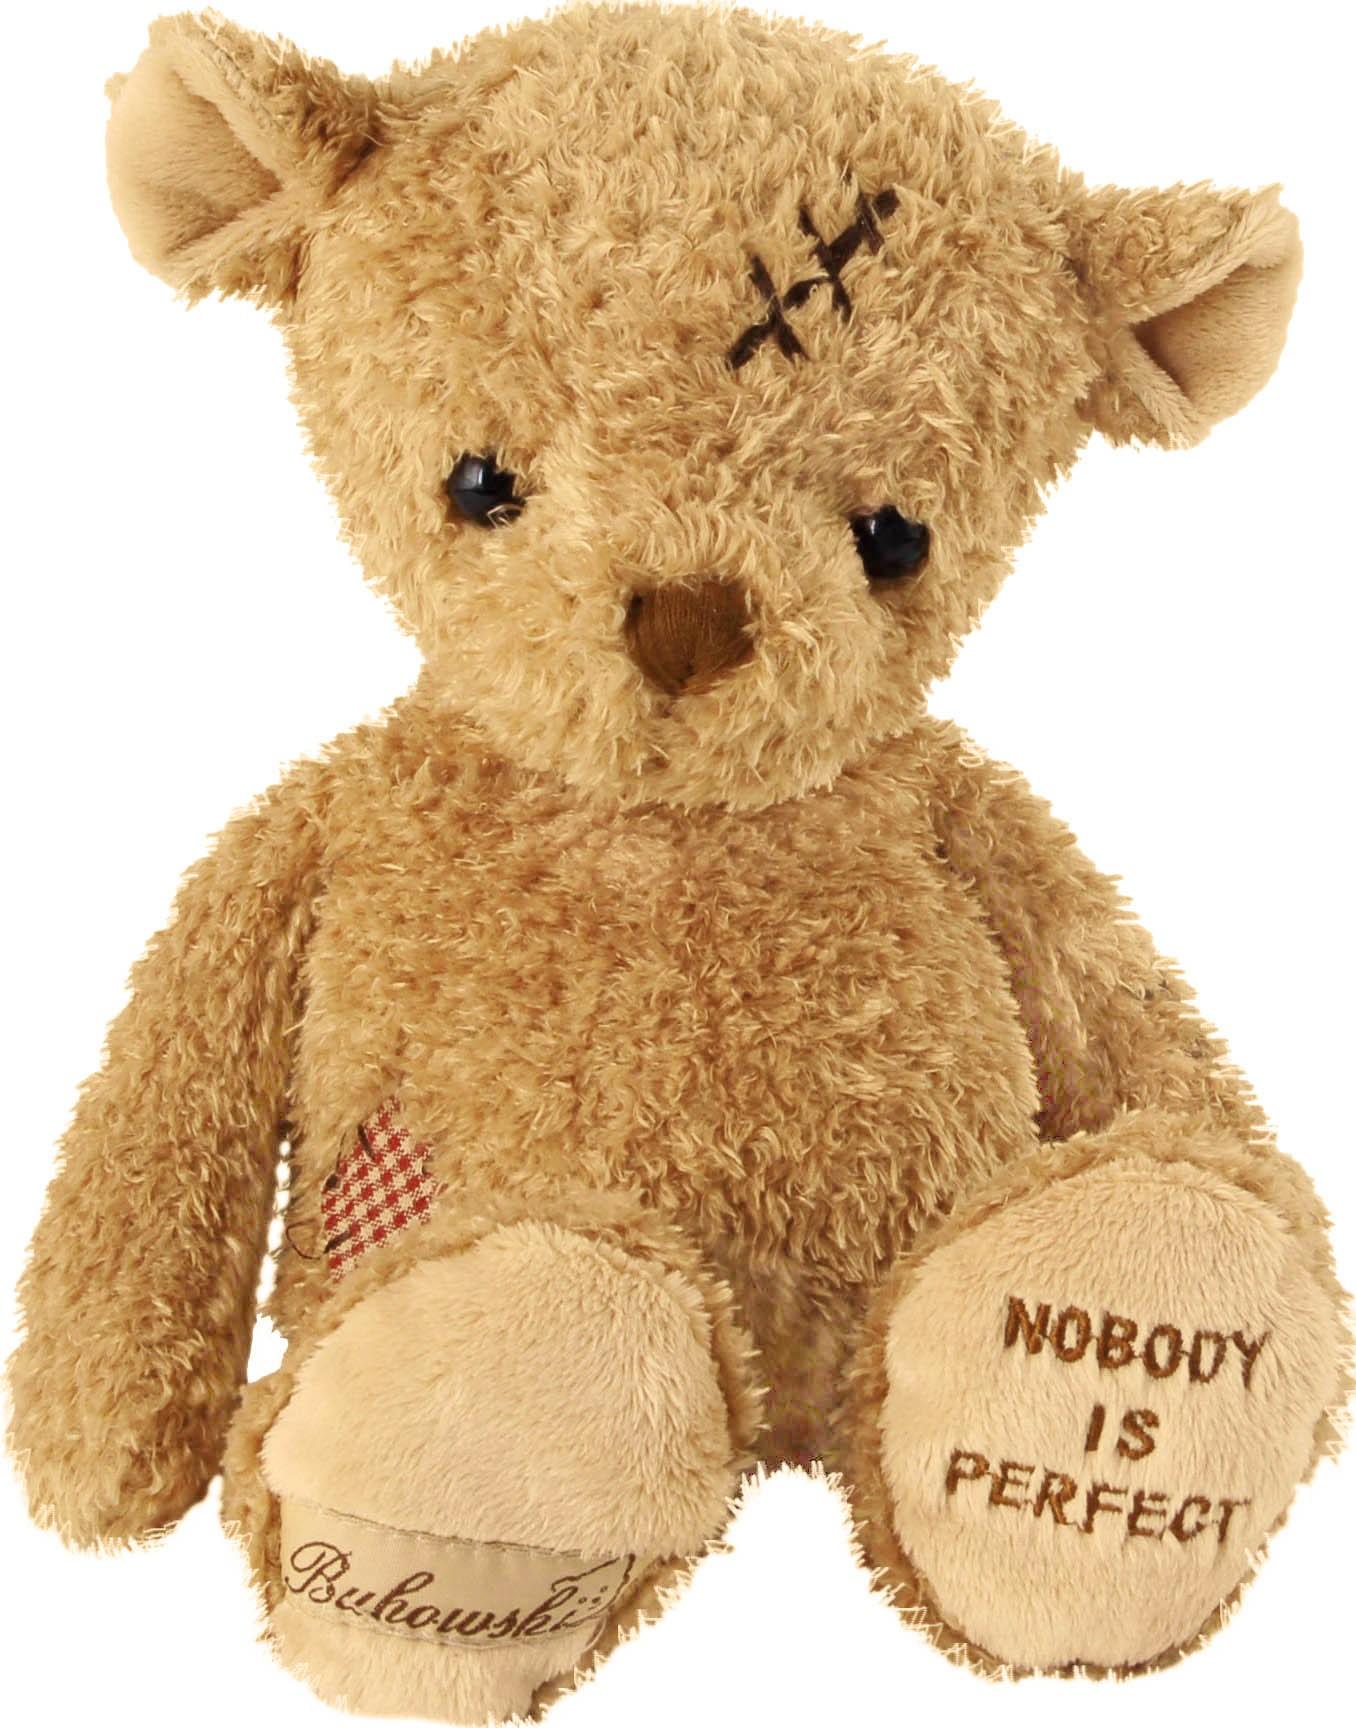 Nobody's Perfect, Bamse - Bukowski Design